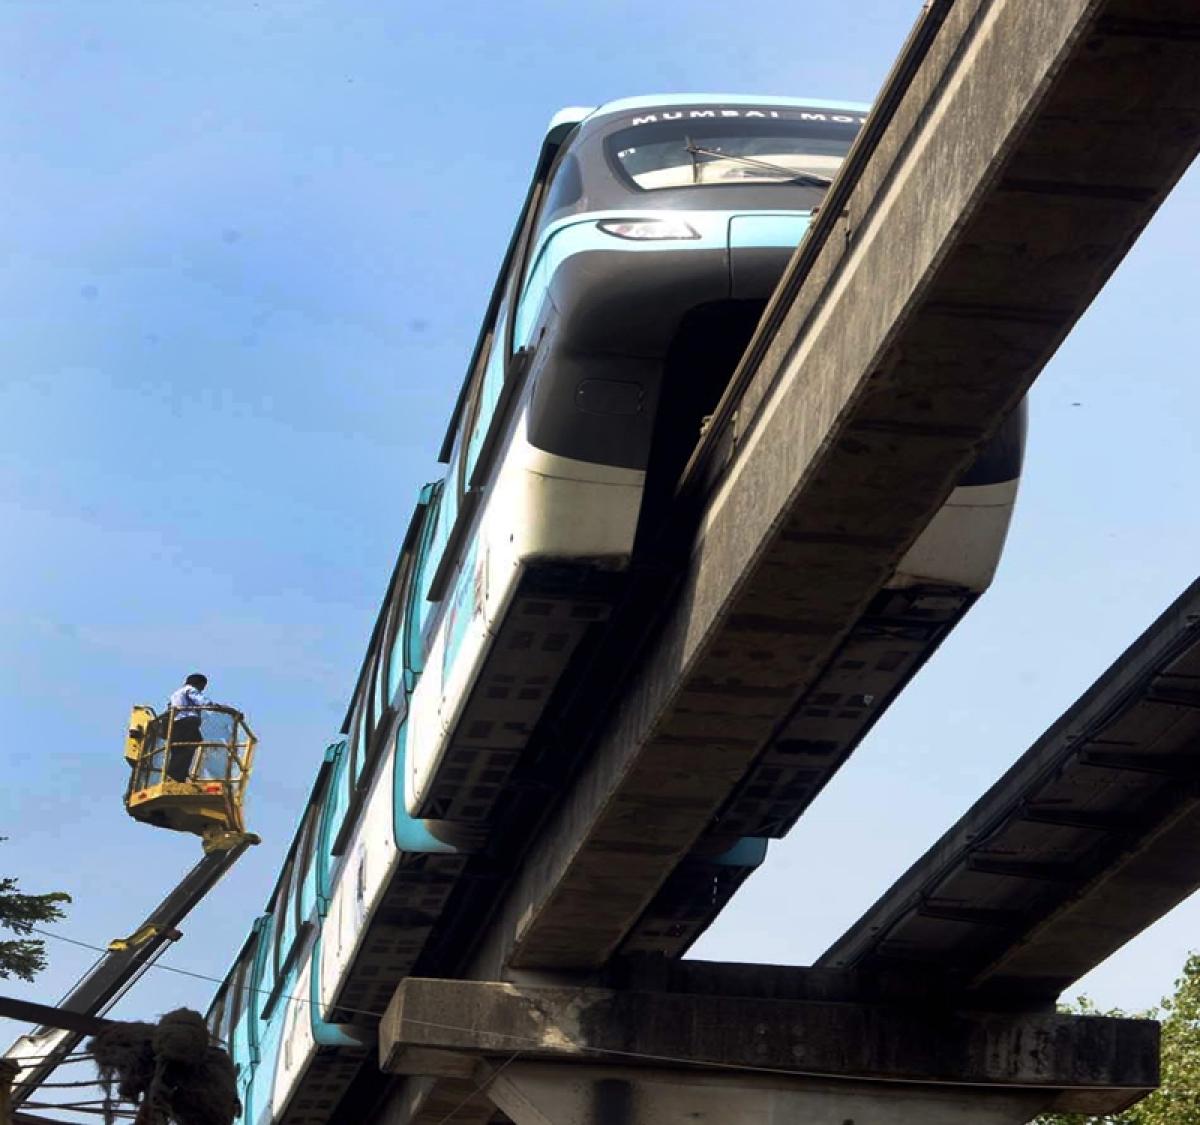 Mumbai: Monorail passengers hang mid-air